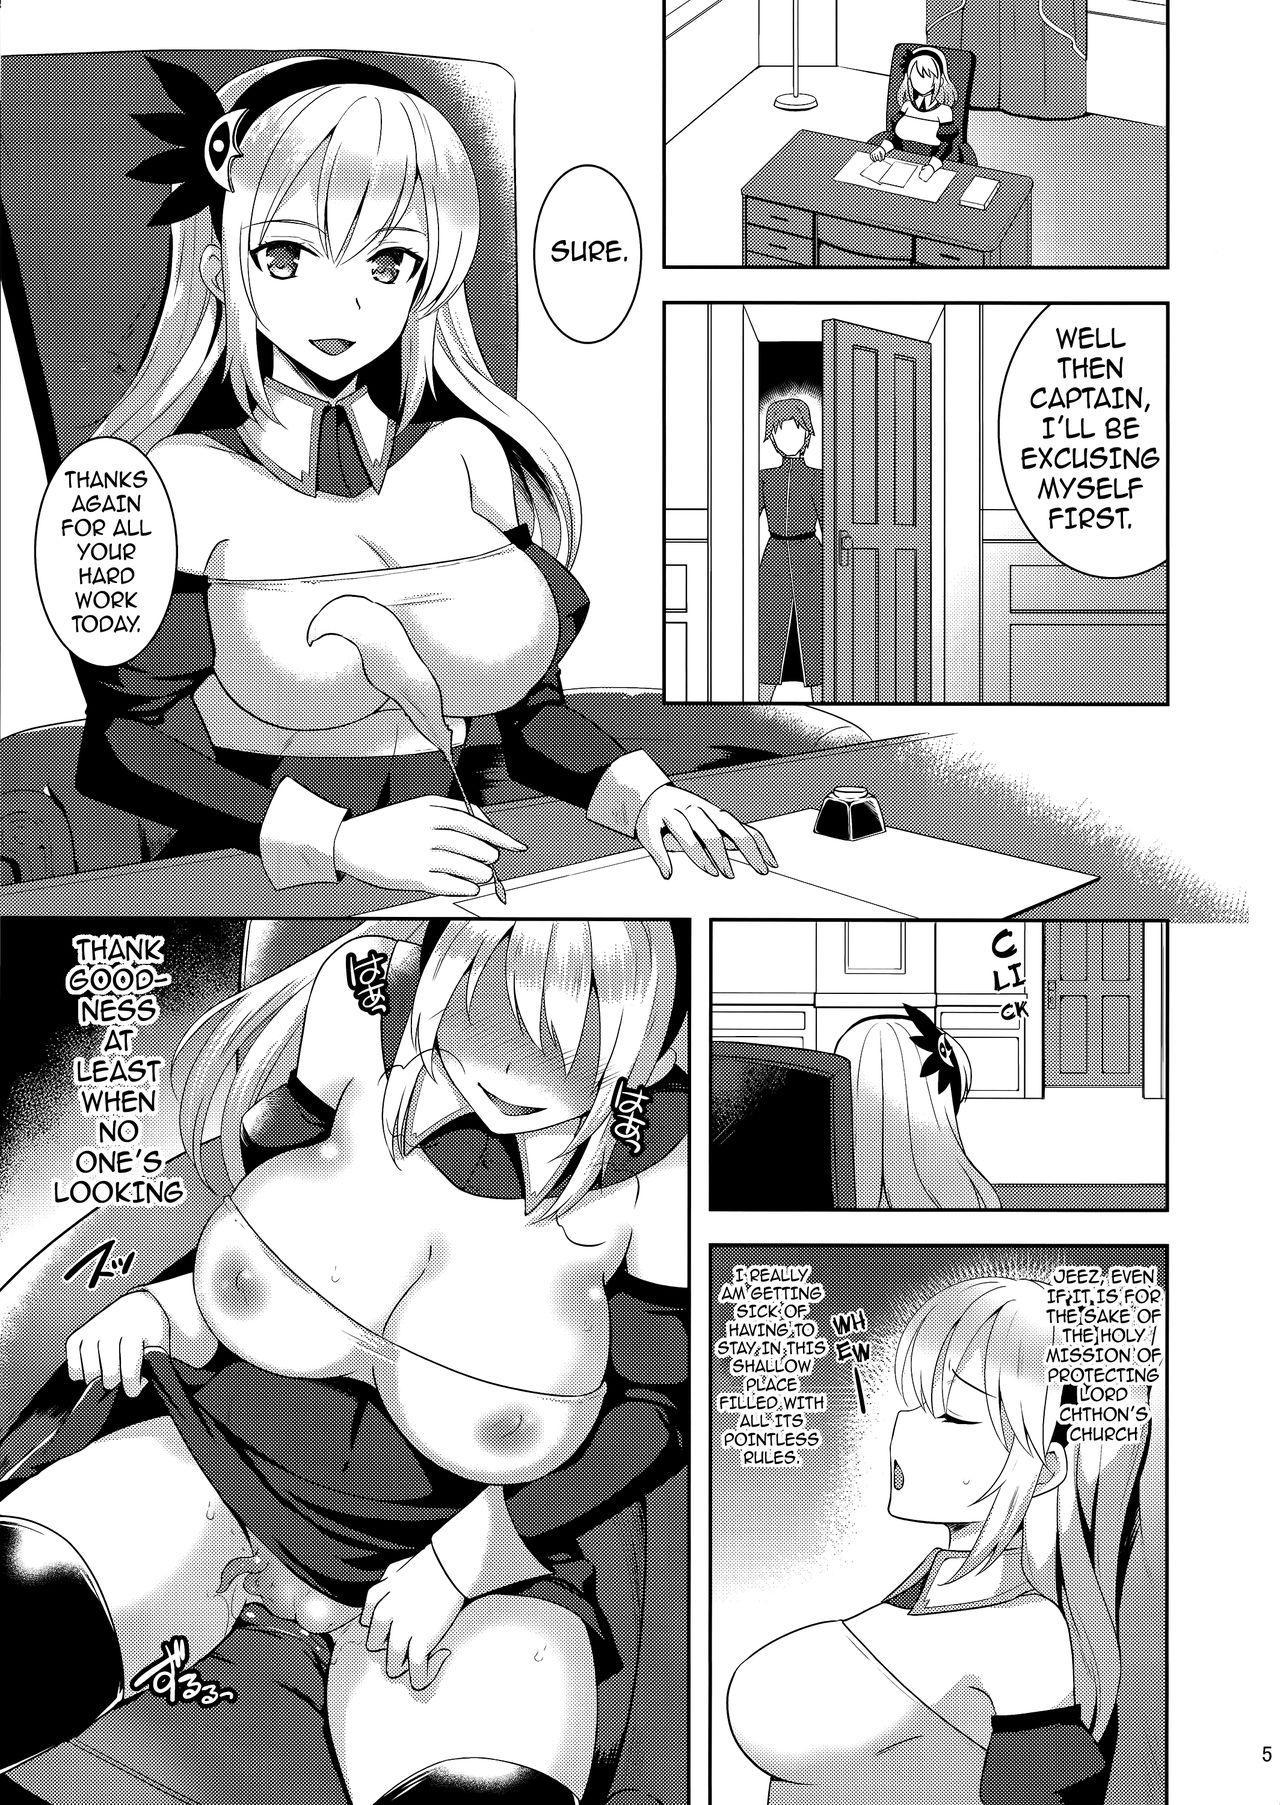 (C96) [Chococornet (Tenro Aya)] Infection - Shinmai Kishi Lavinia no Junan | Infection - The Passion of a Novice Knight  [English] {darknight} 3